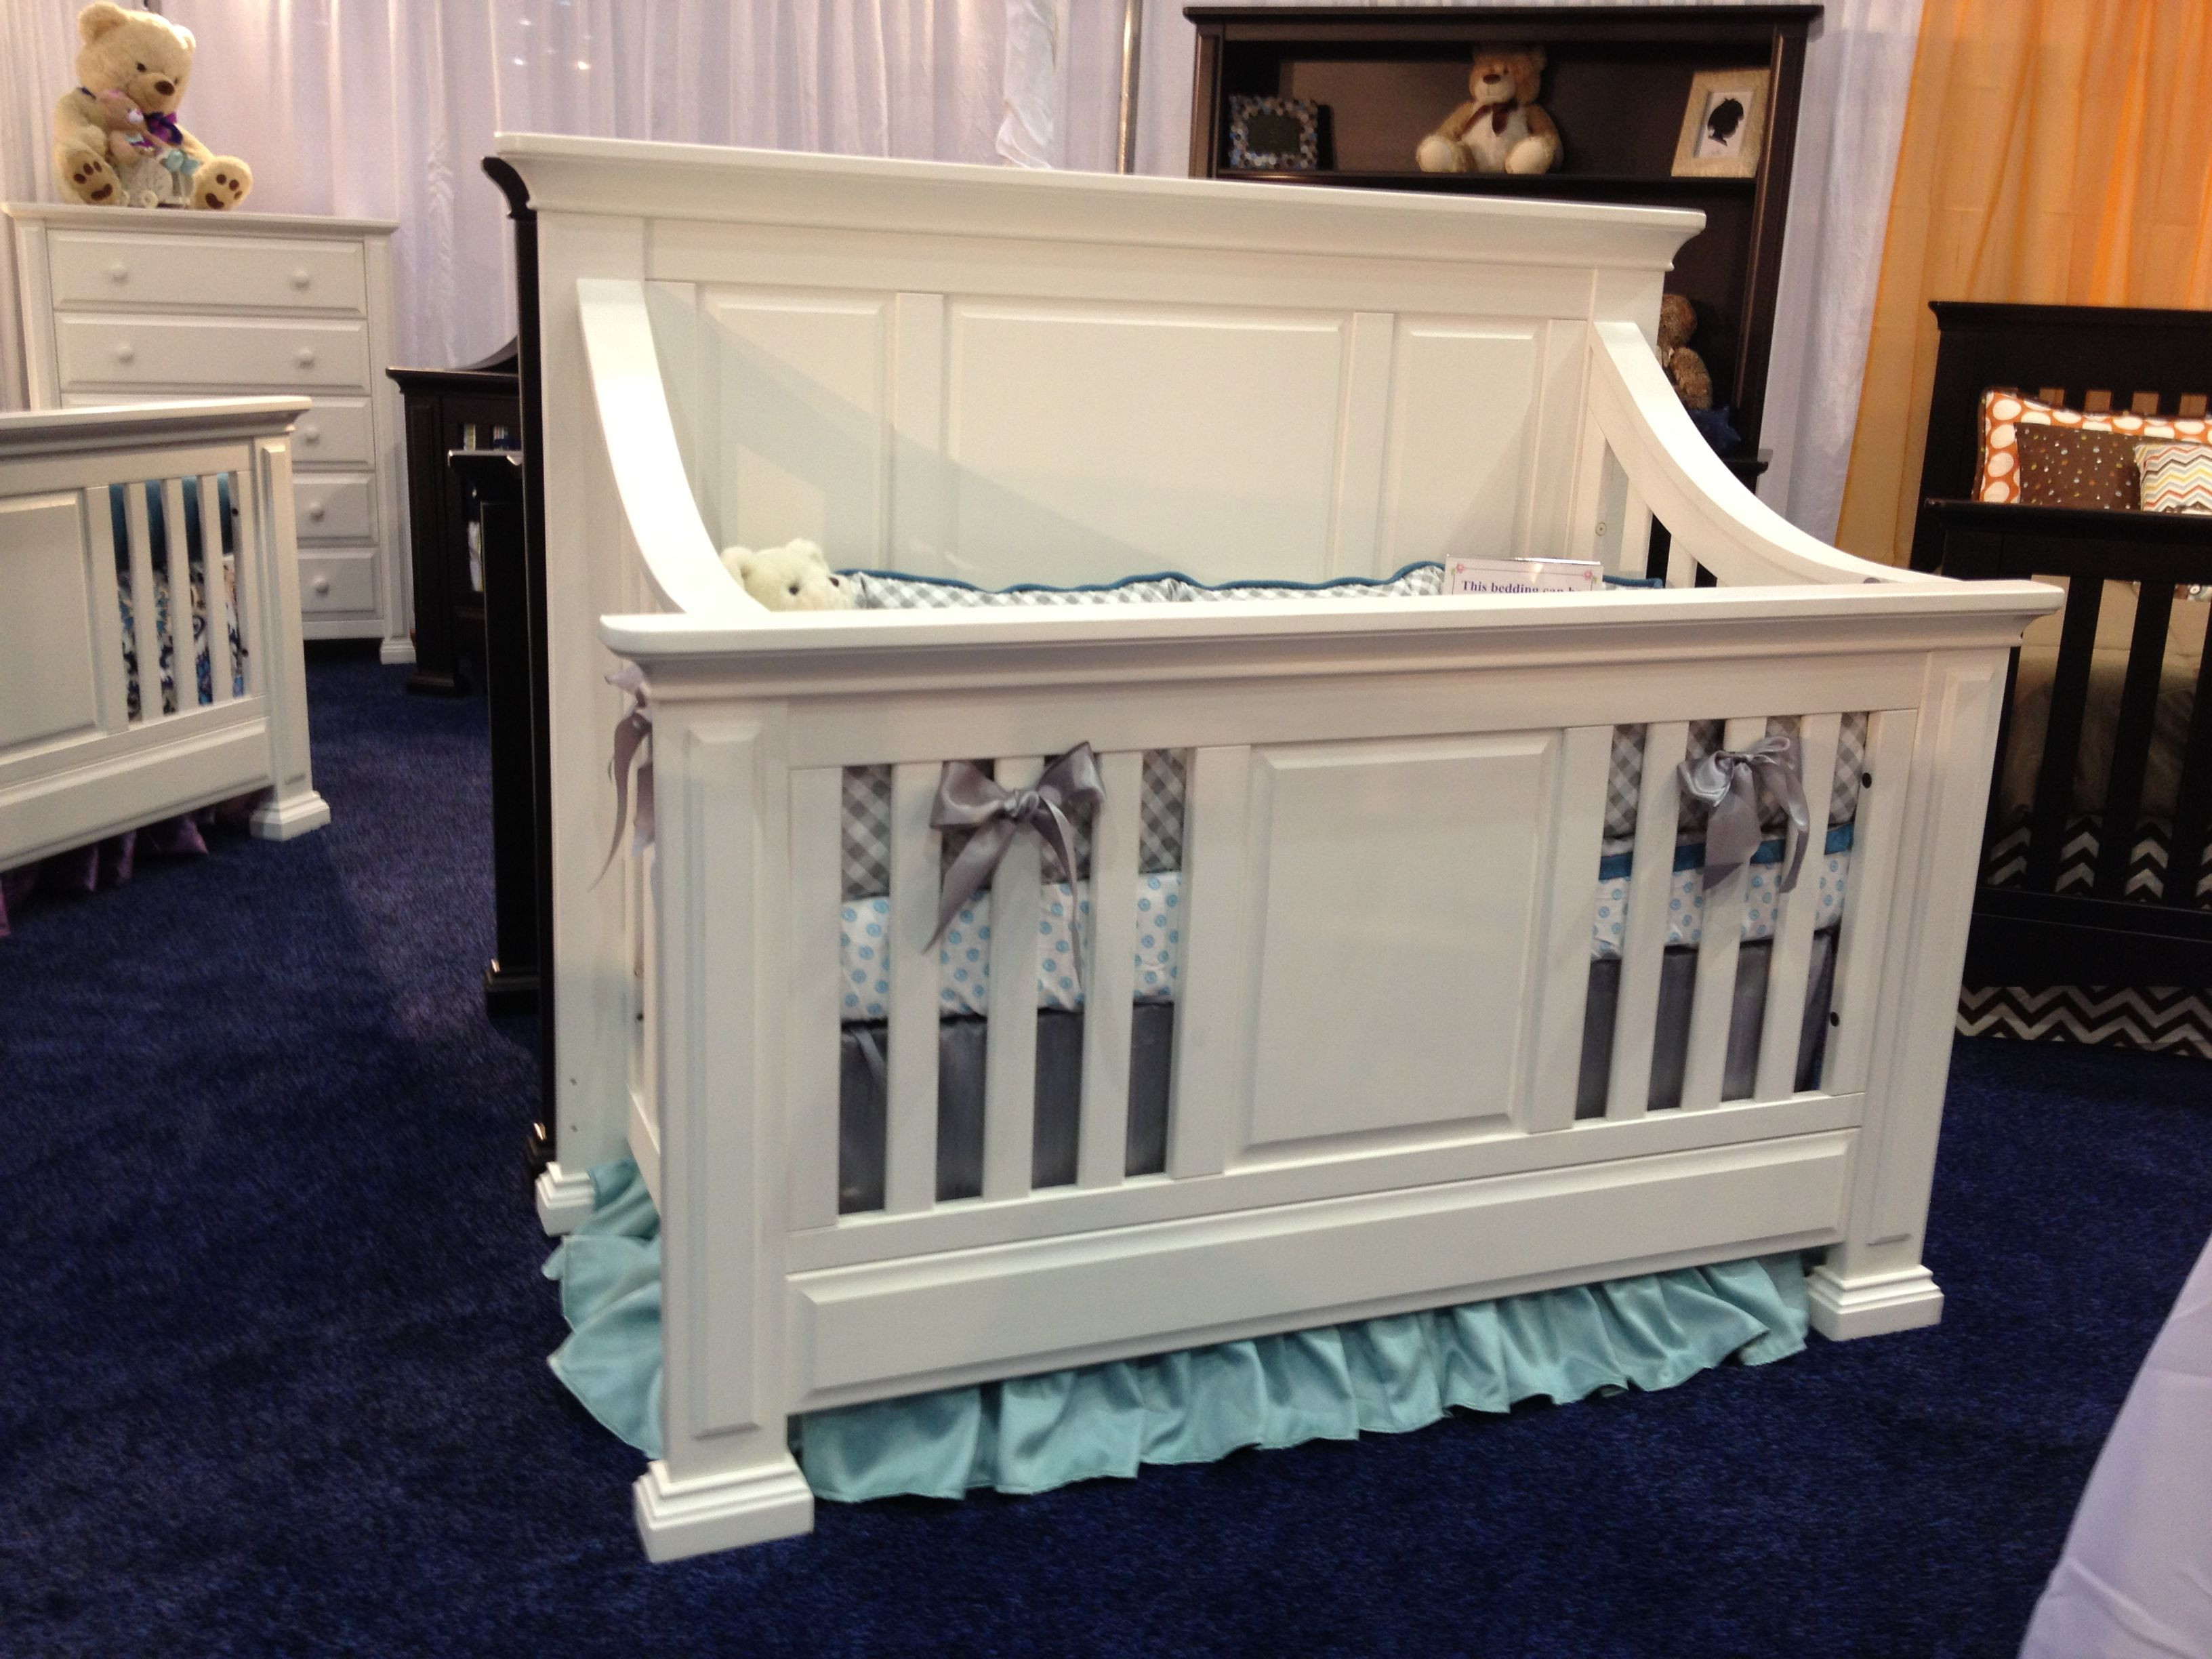 s cribs walmart in ip chesapeake convertible com me baby fall snow crib on dream